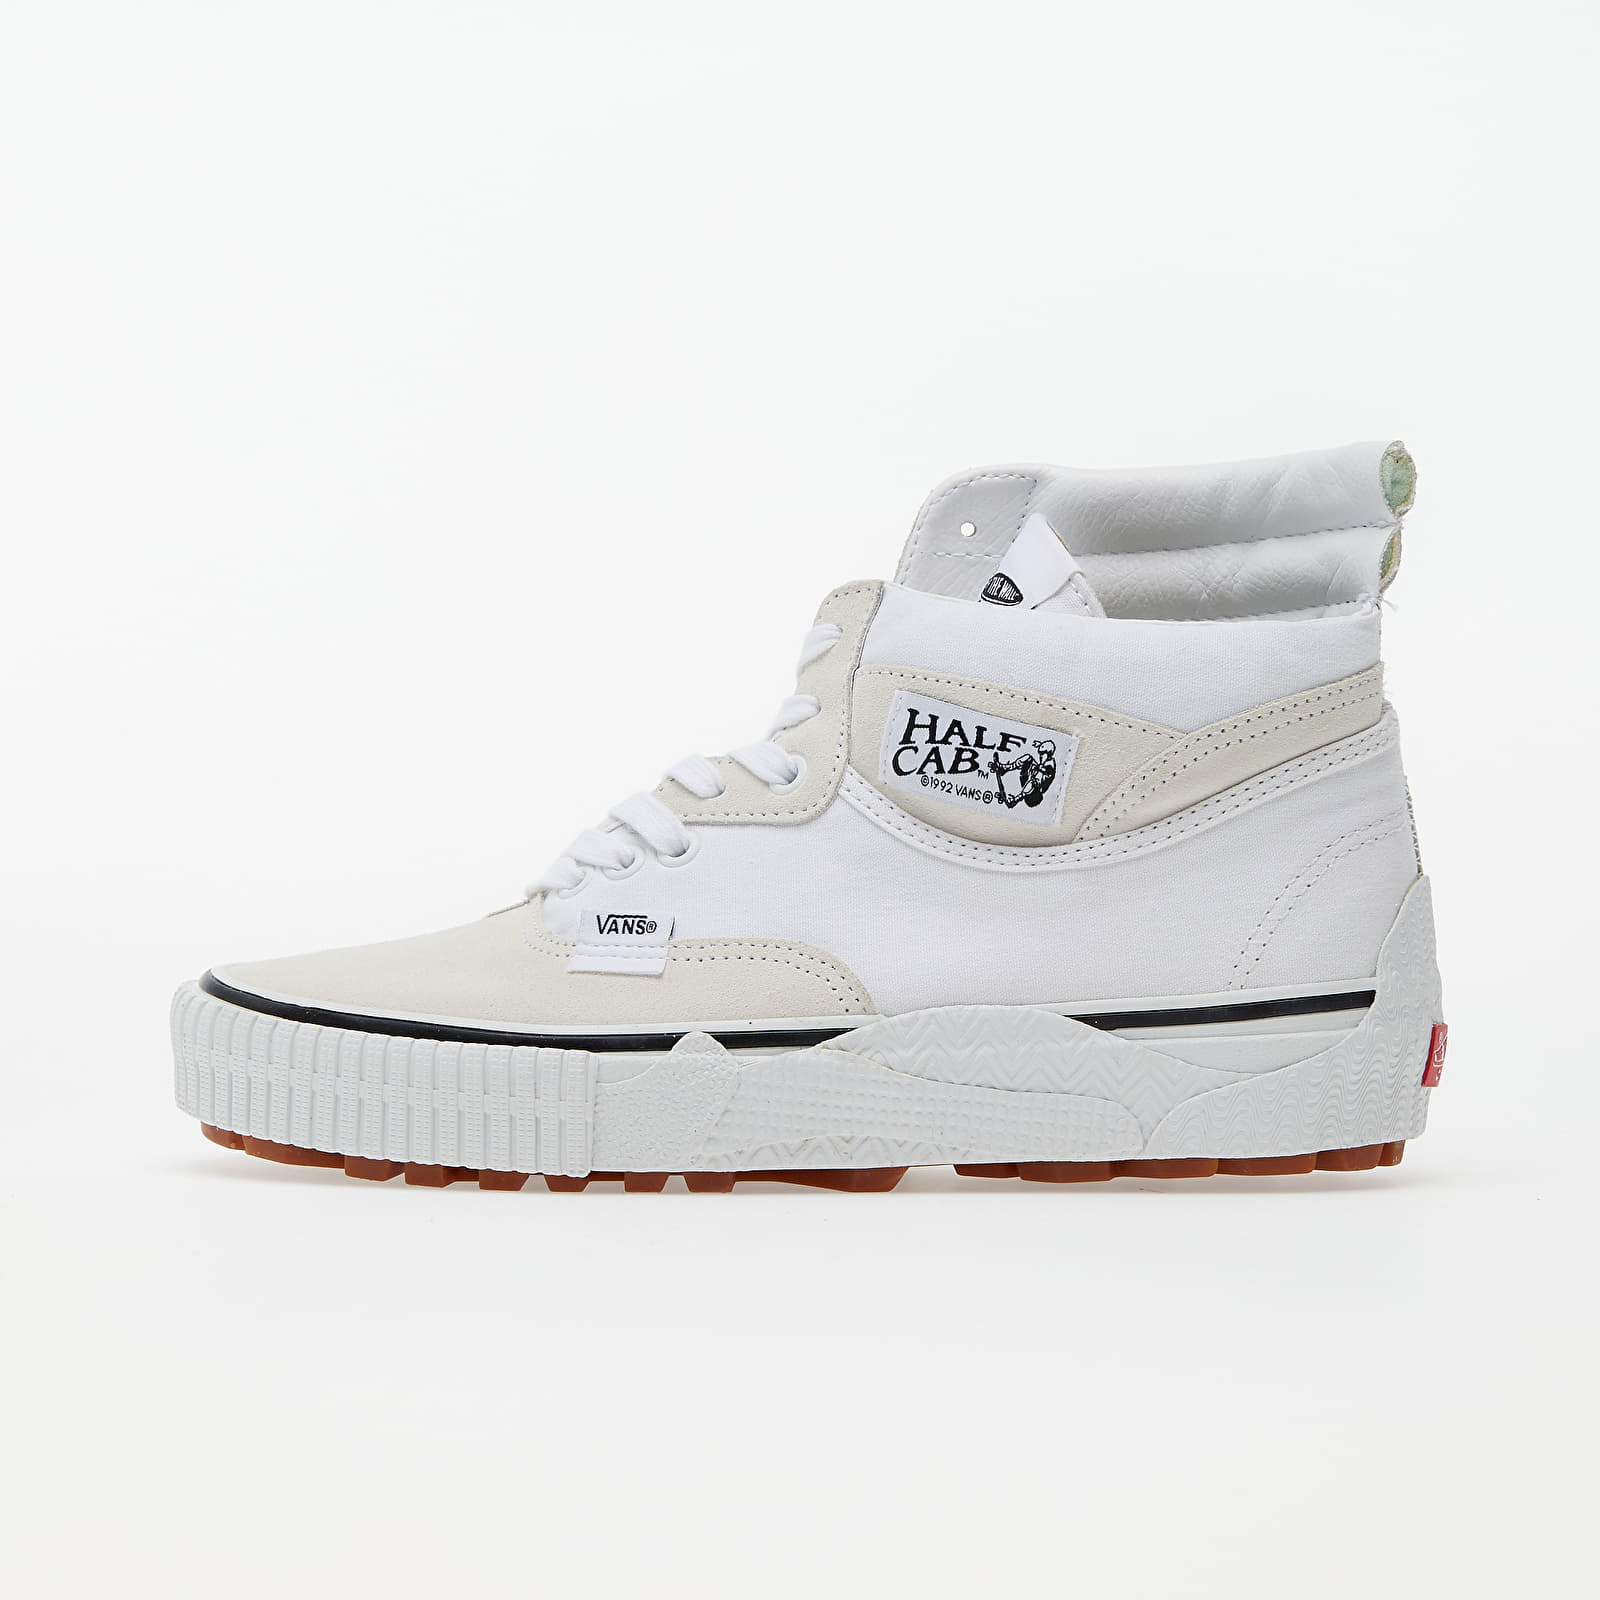 Pánské tenisky a boty Vans Cap Mash Hi LX (Suede/ Canvas) White/ Black